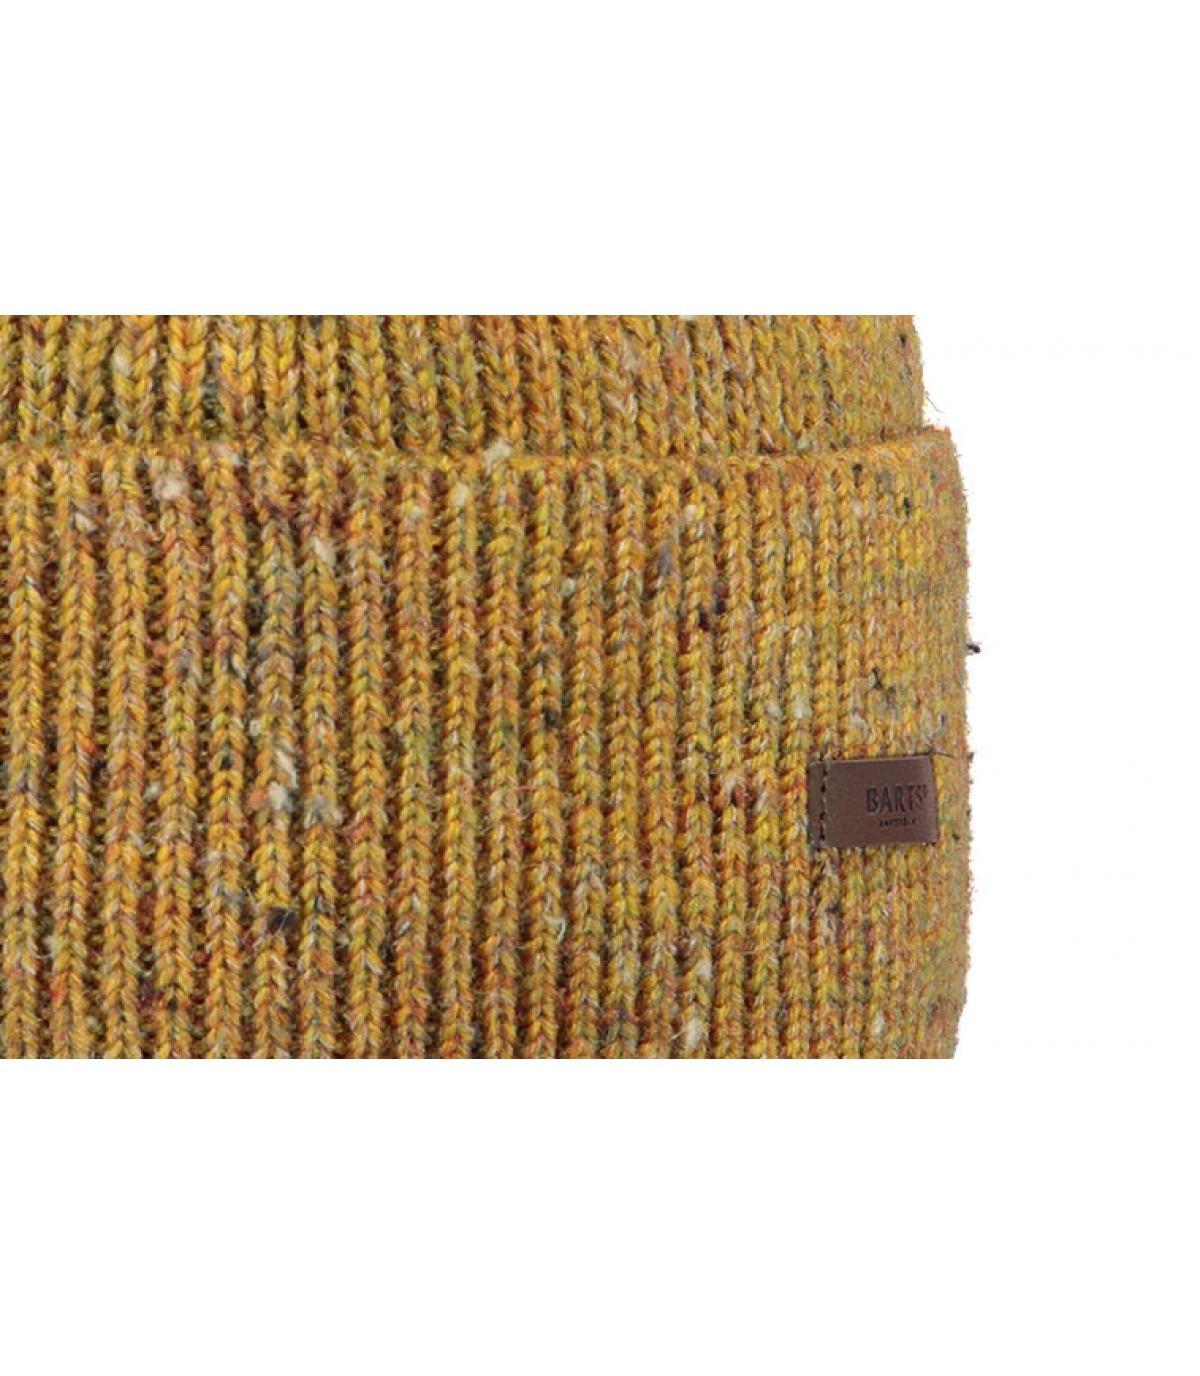 Détails Callac Beanie yellow - image 3